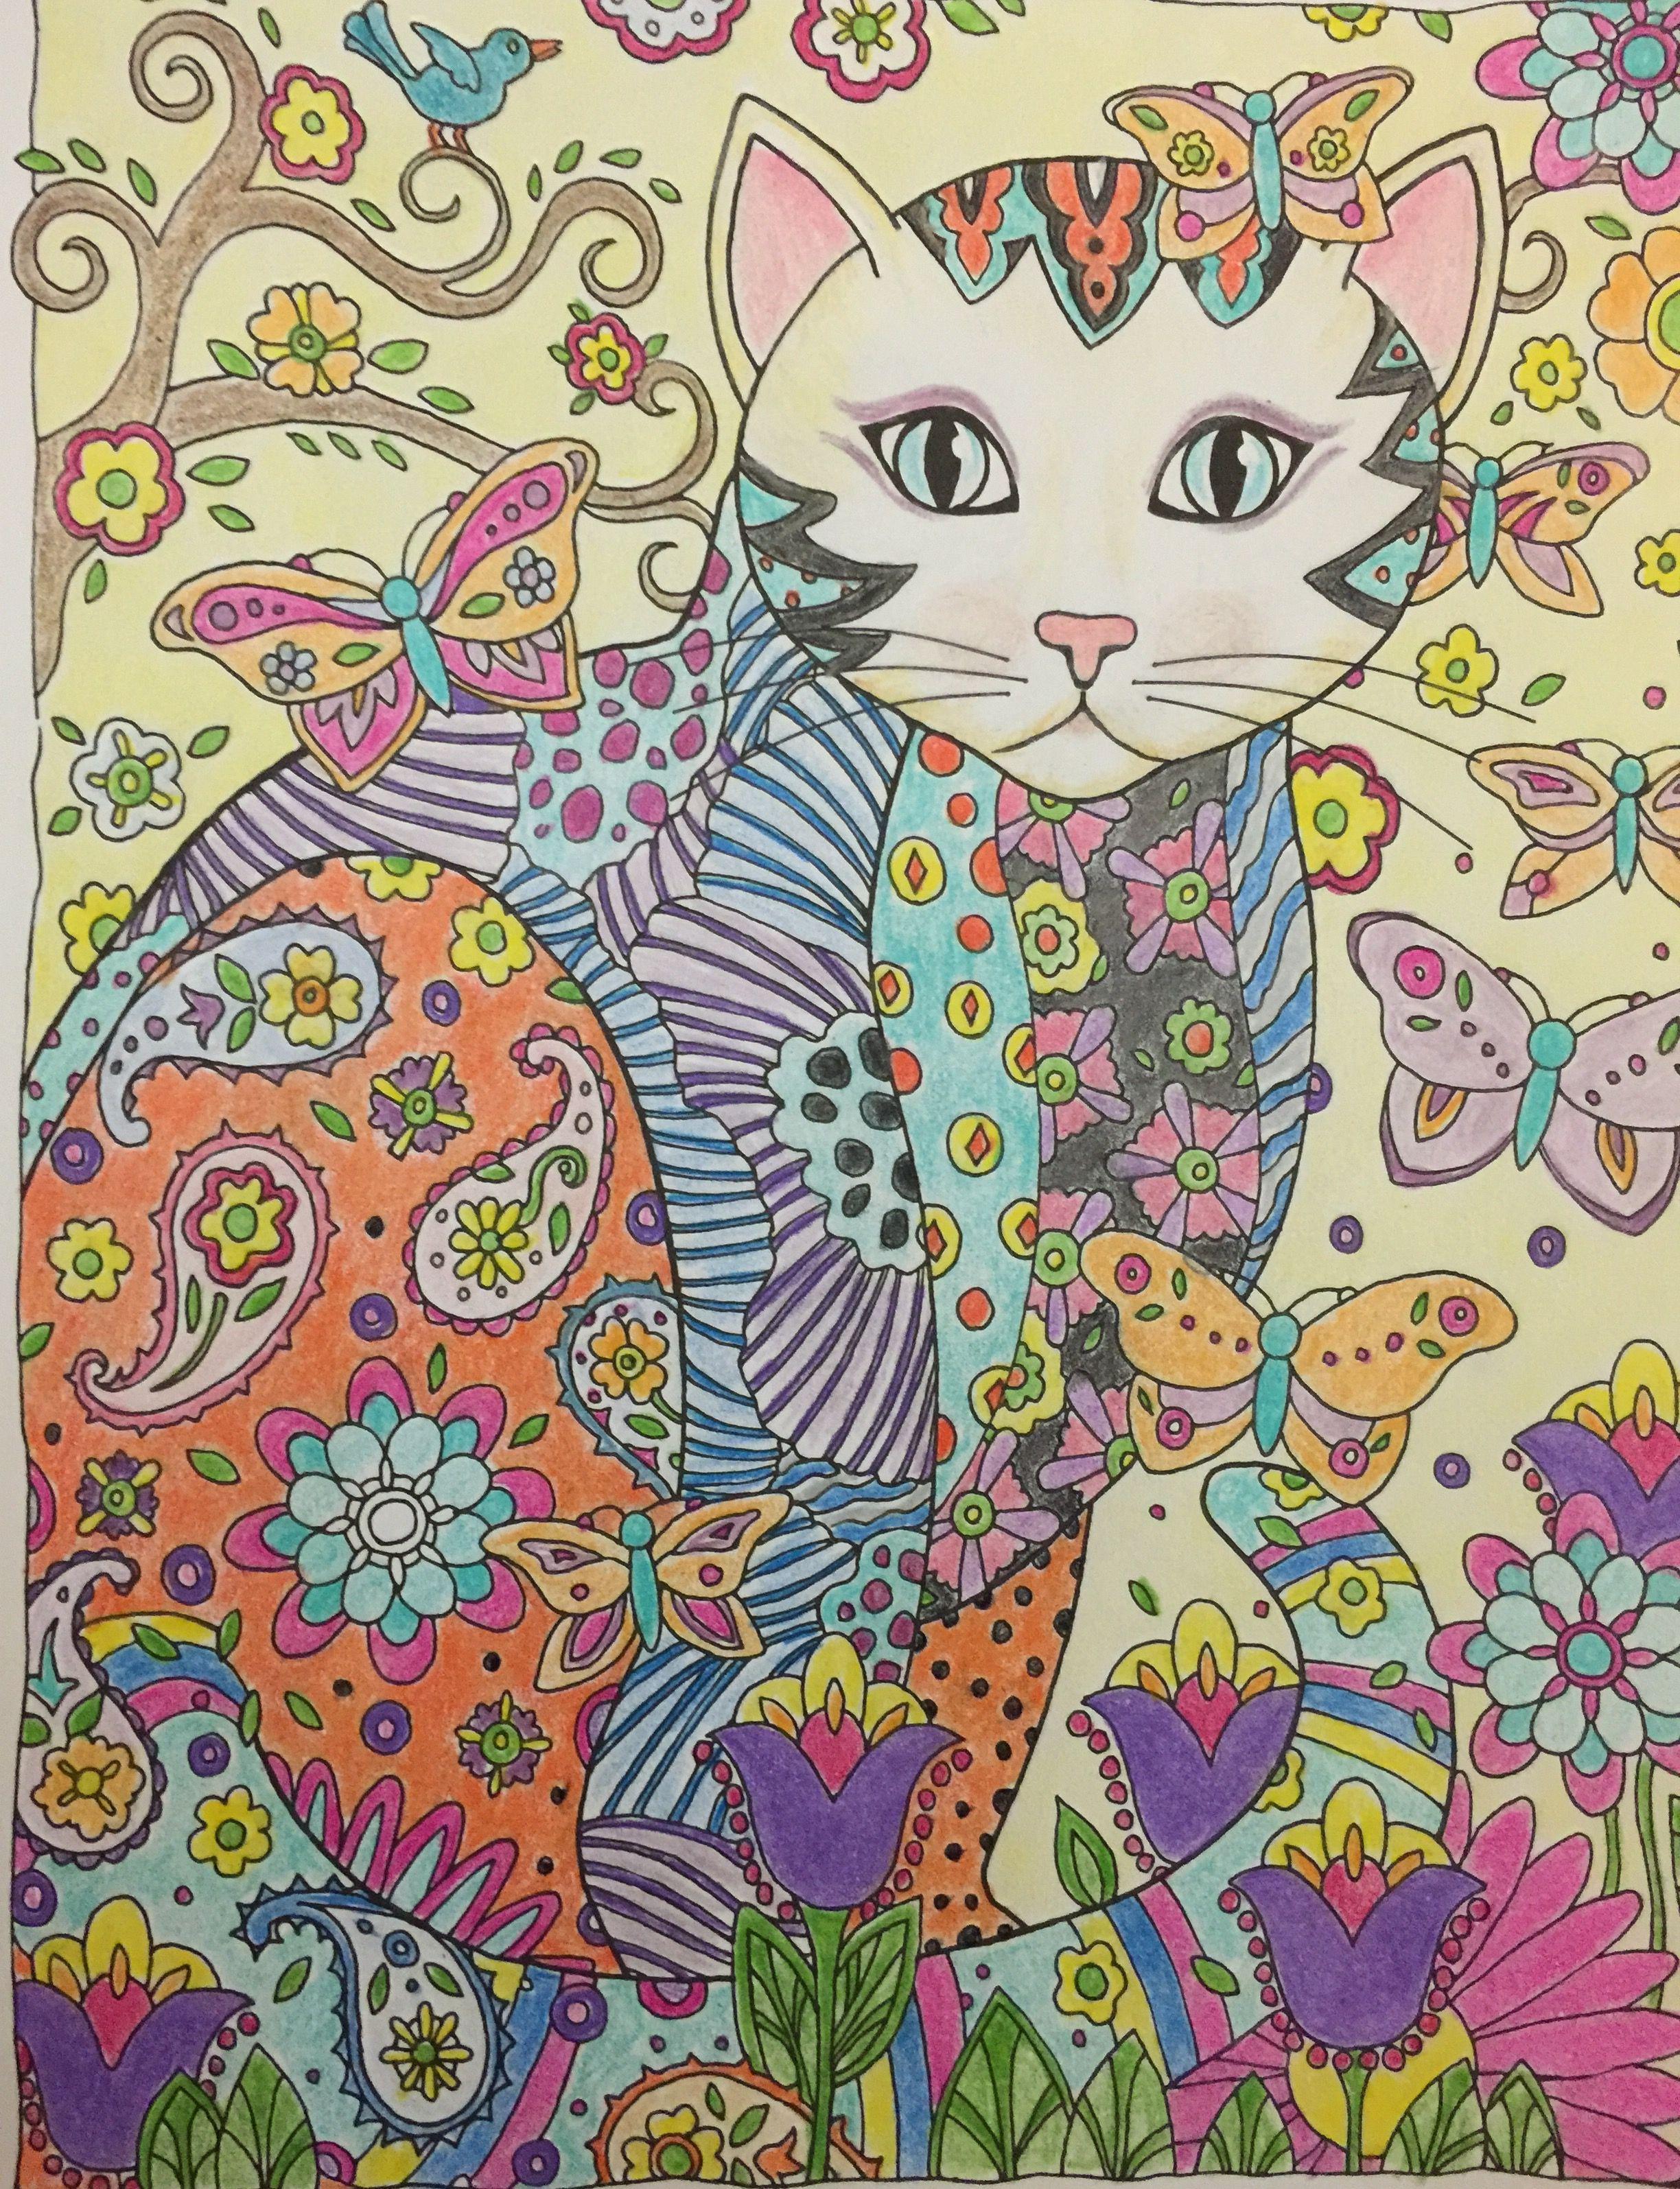 Pin de Sietske en ~Cats~   Pinterest   Fotografía de gatos, Arte ...